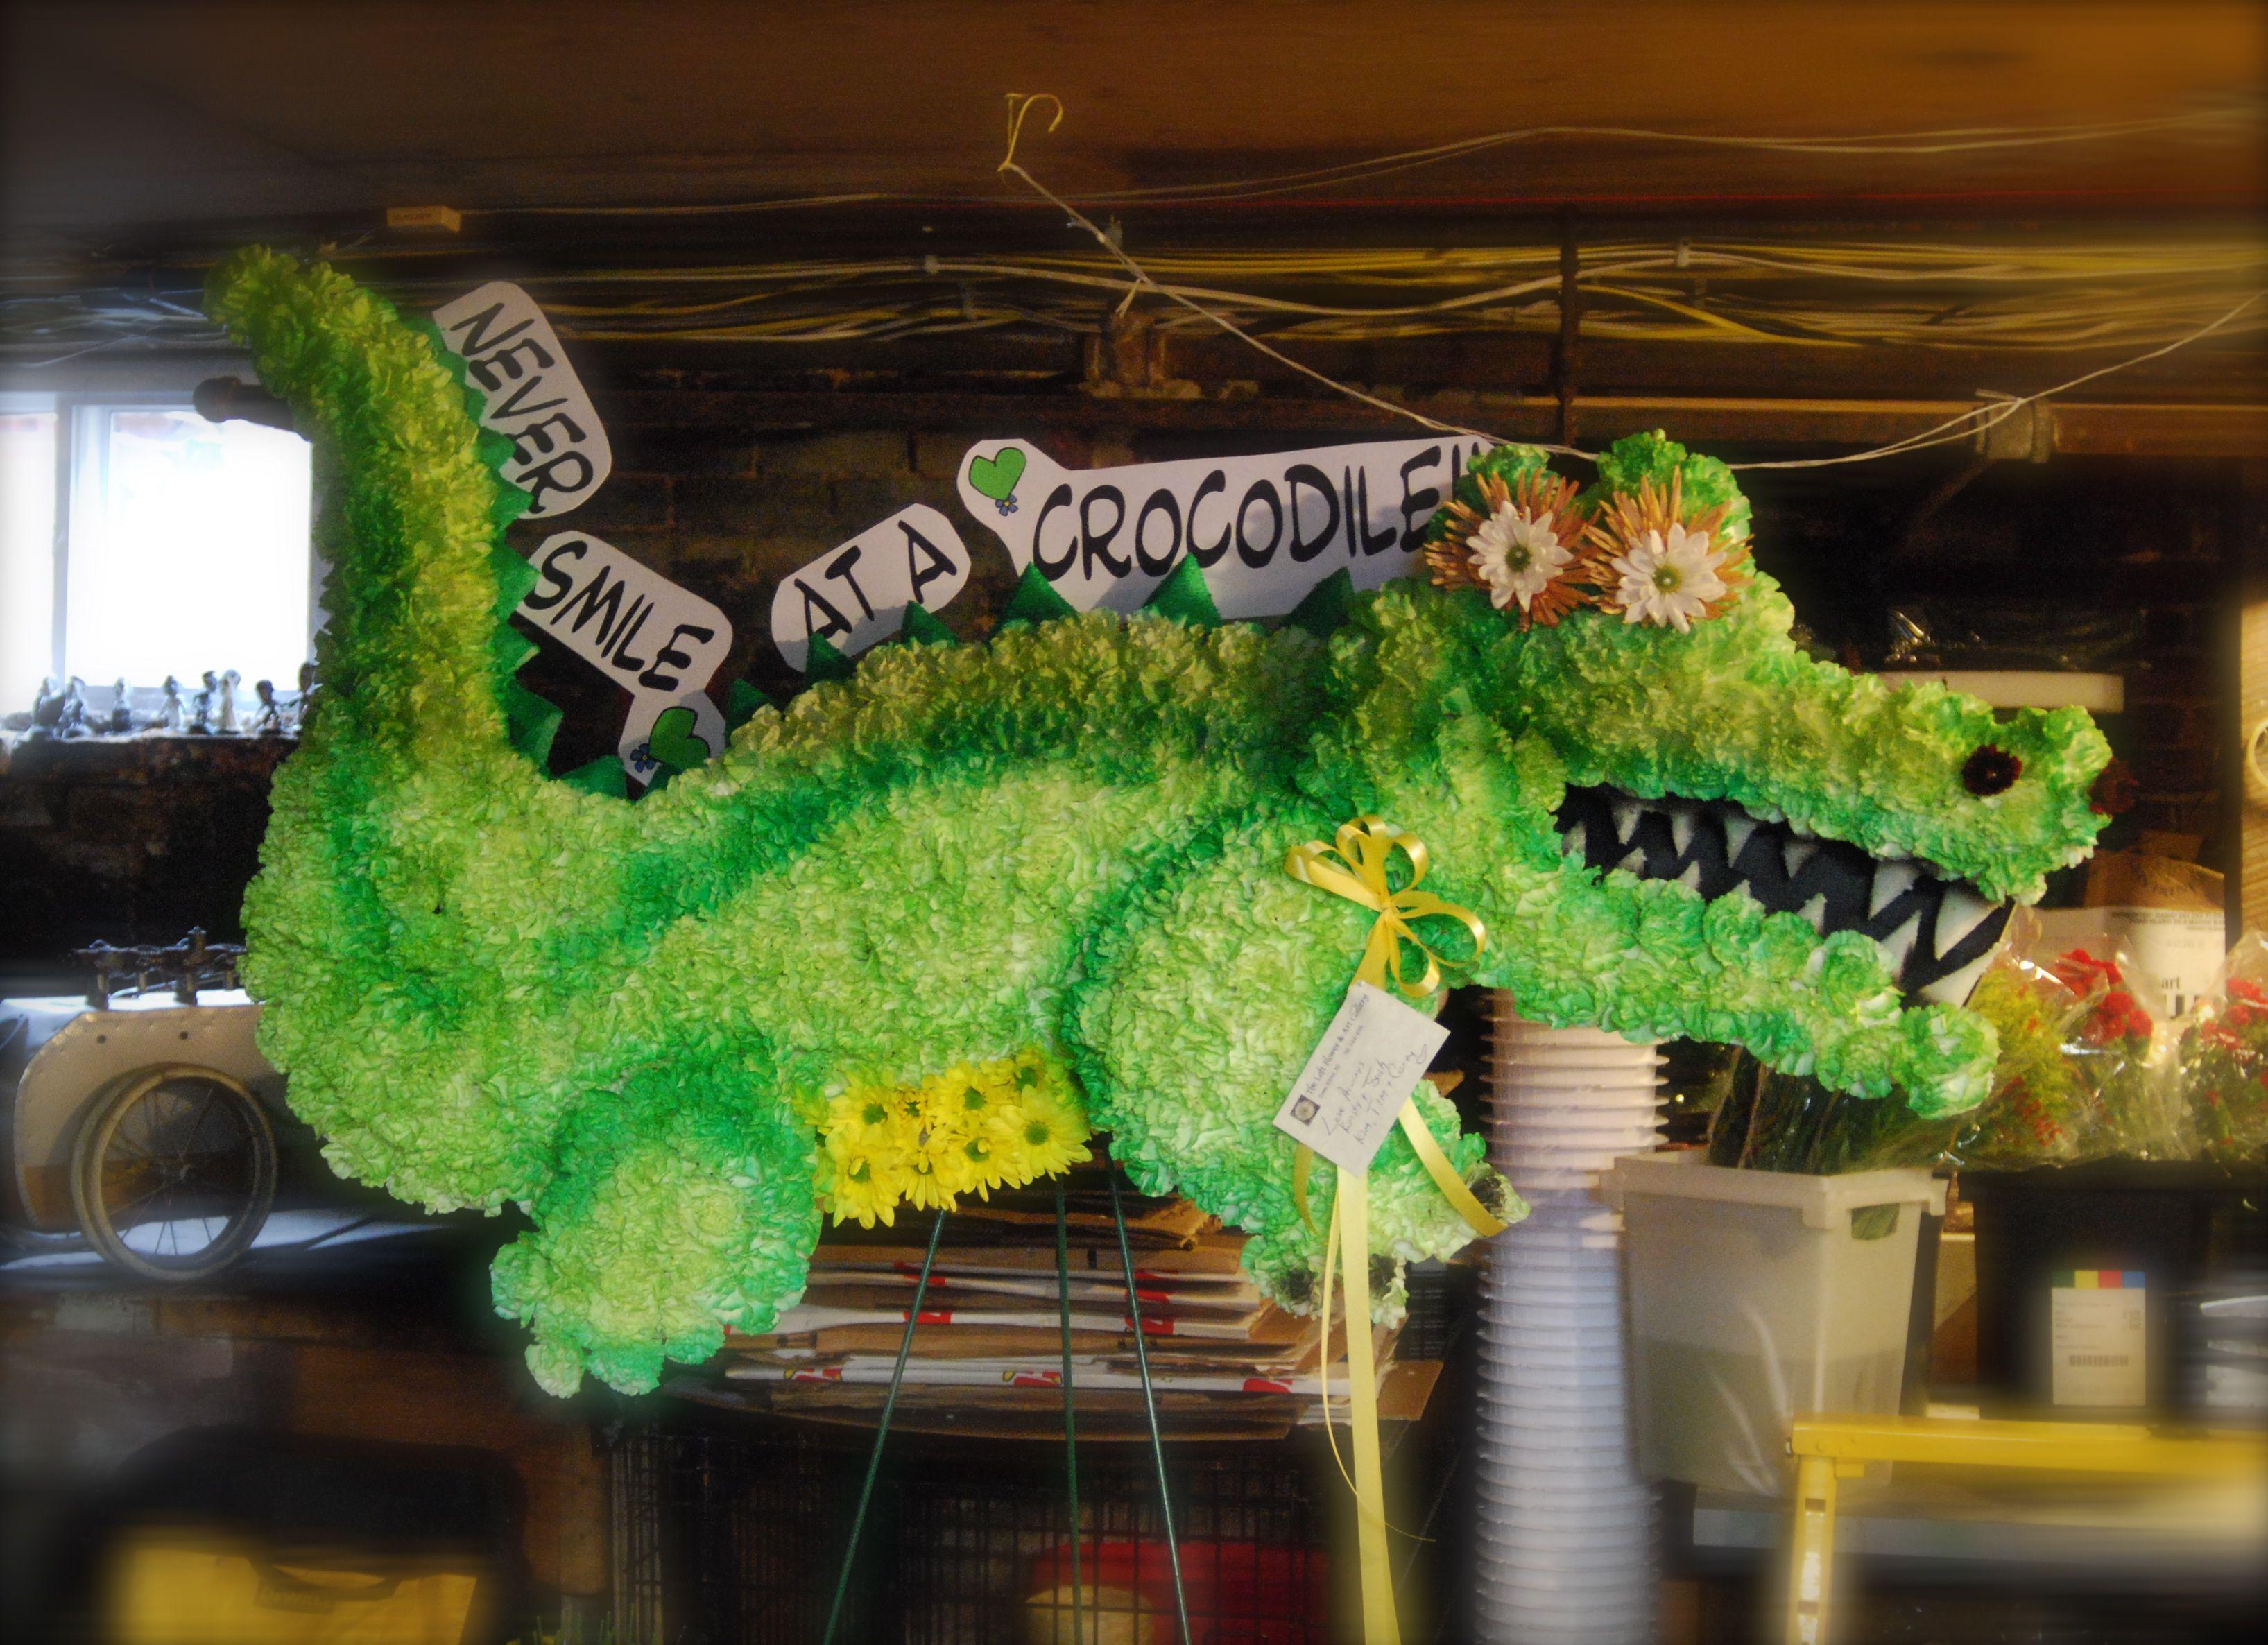 Crocodile custom funeral flowers sculpture theloftflorist crocodile custom funeral flowers sculpture theloftflorist izmirmasajfo